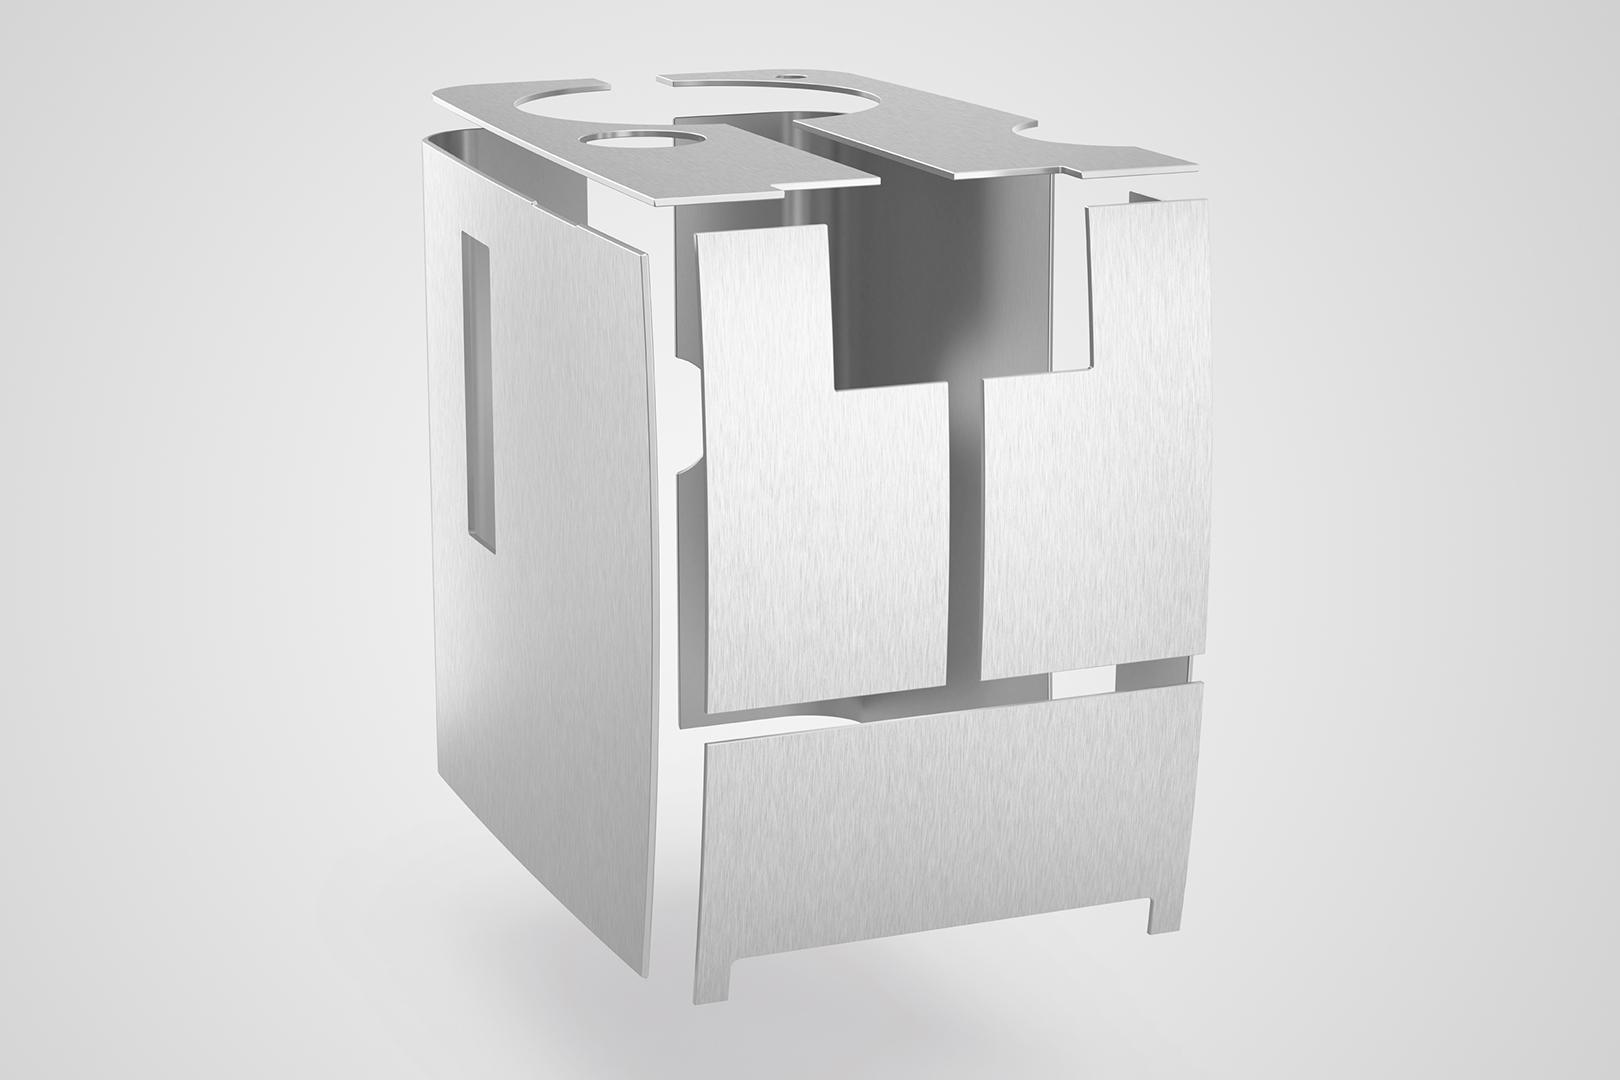 Jura ENA 8 Superautomatic Espresso Machine - Massive Aluminum